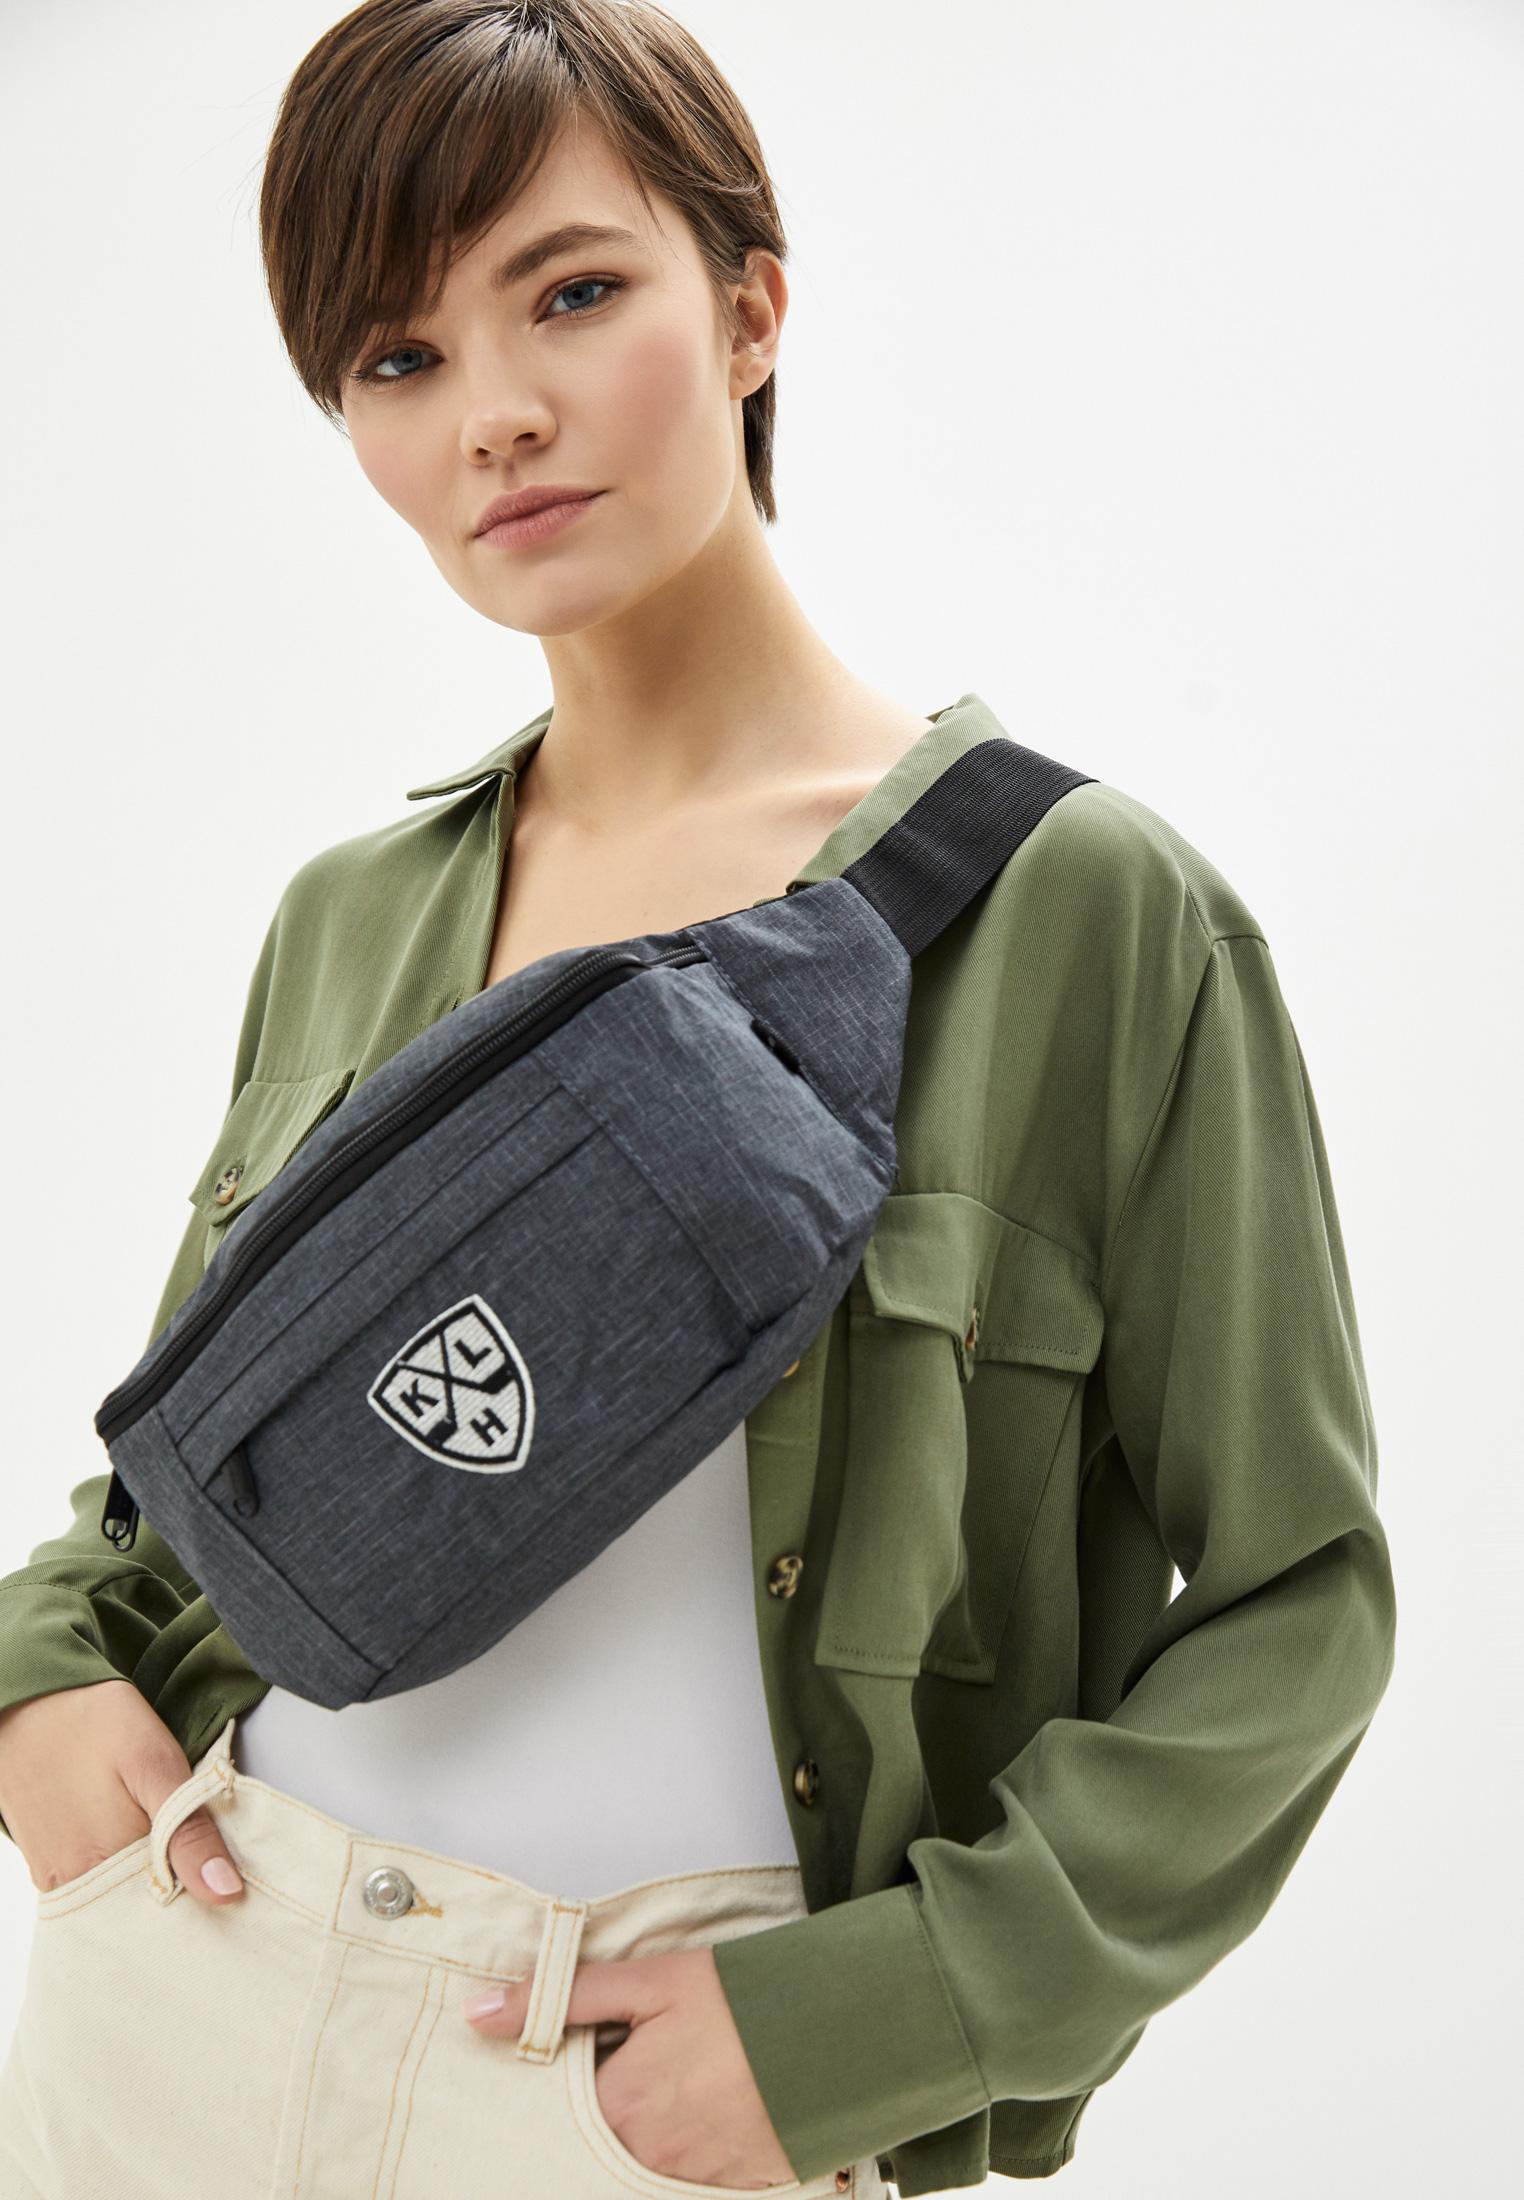 Спортивная сумка Atributika & Club™ Сумка поясная Atributika & Club™